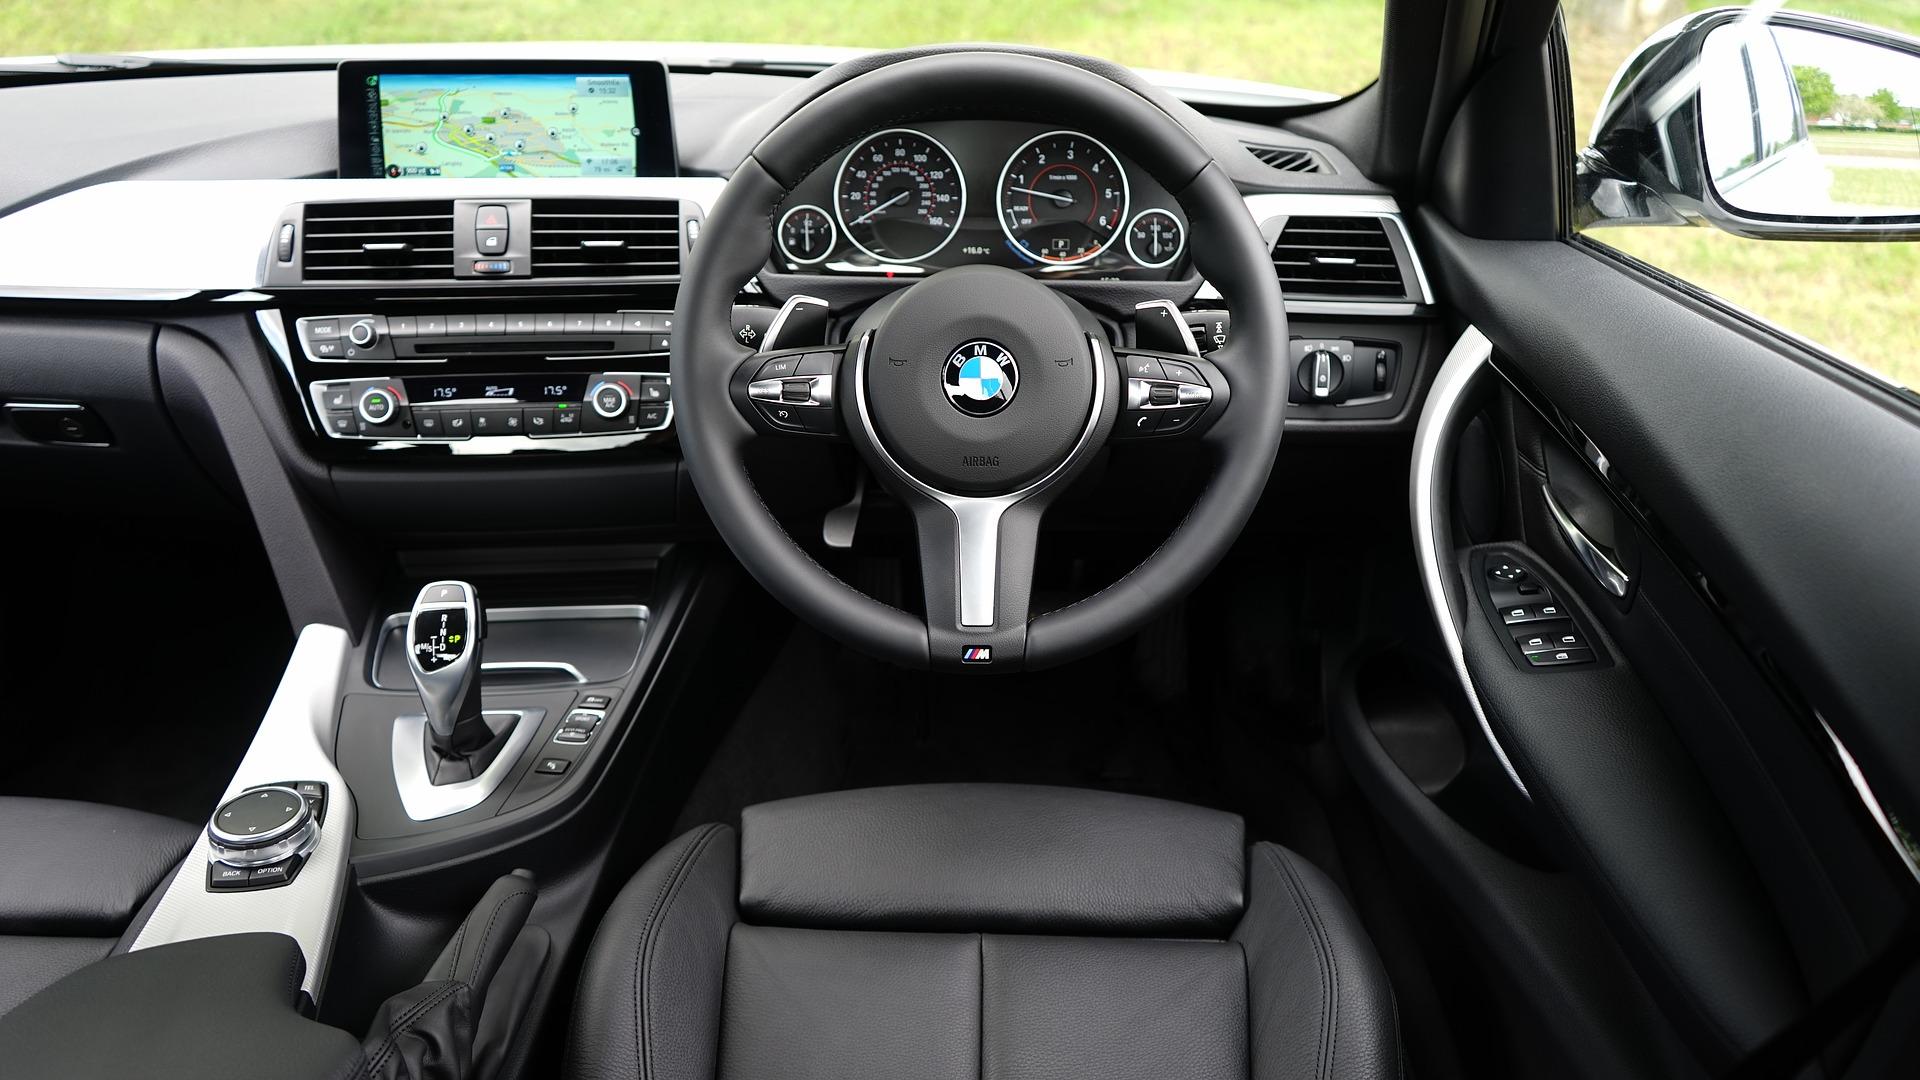 Interior of black BMW X1 car